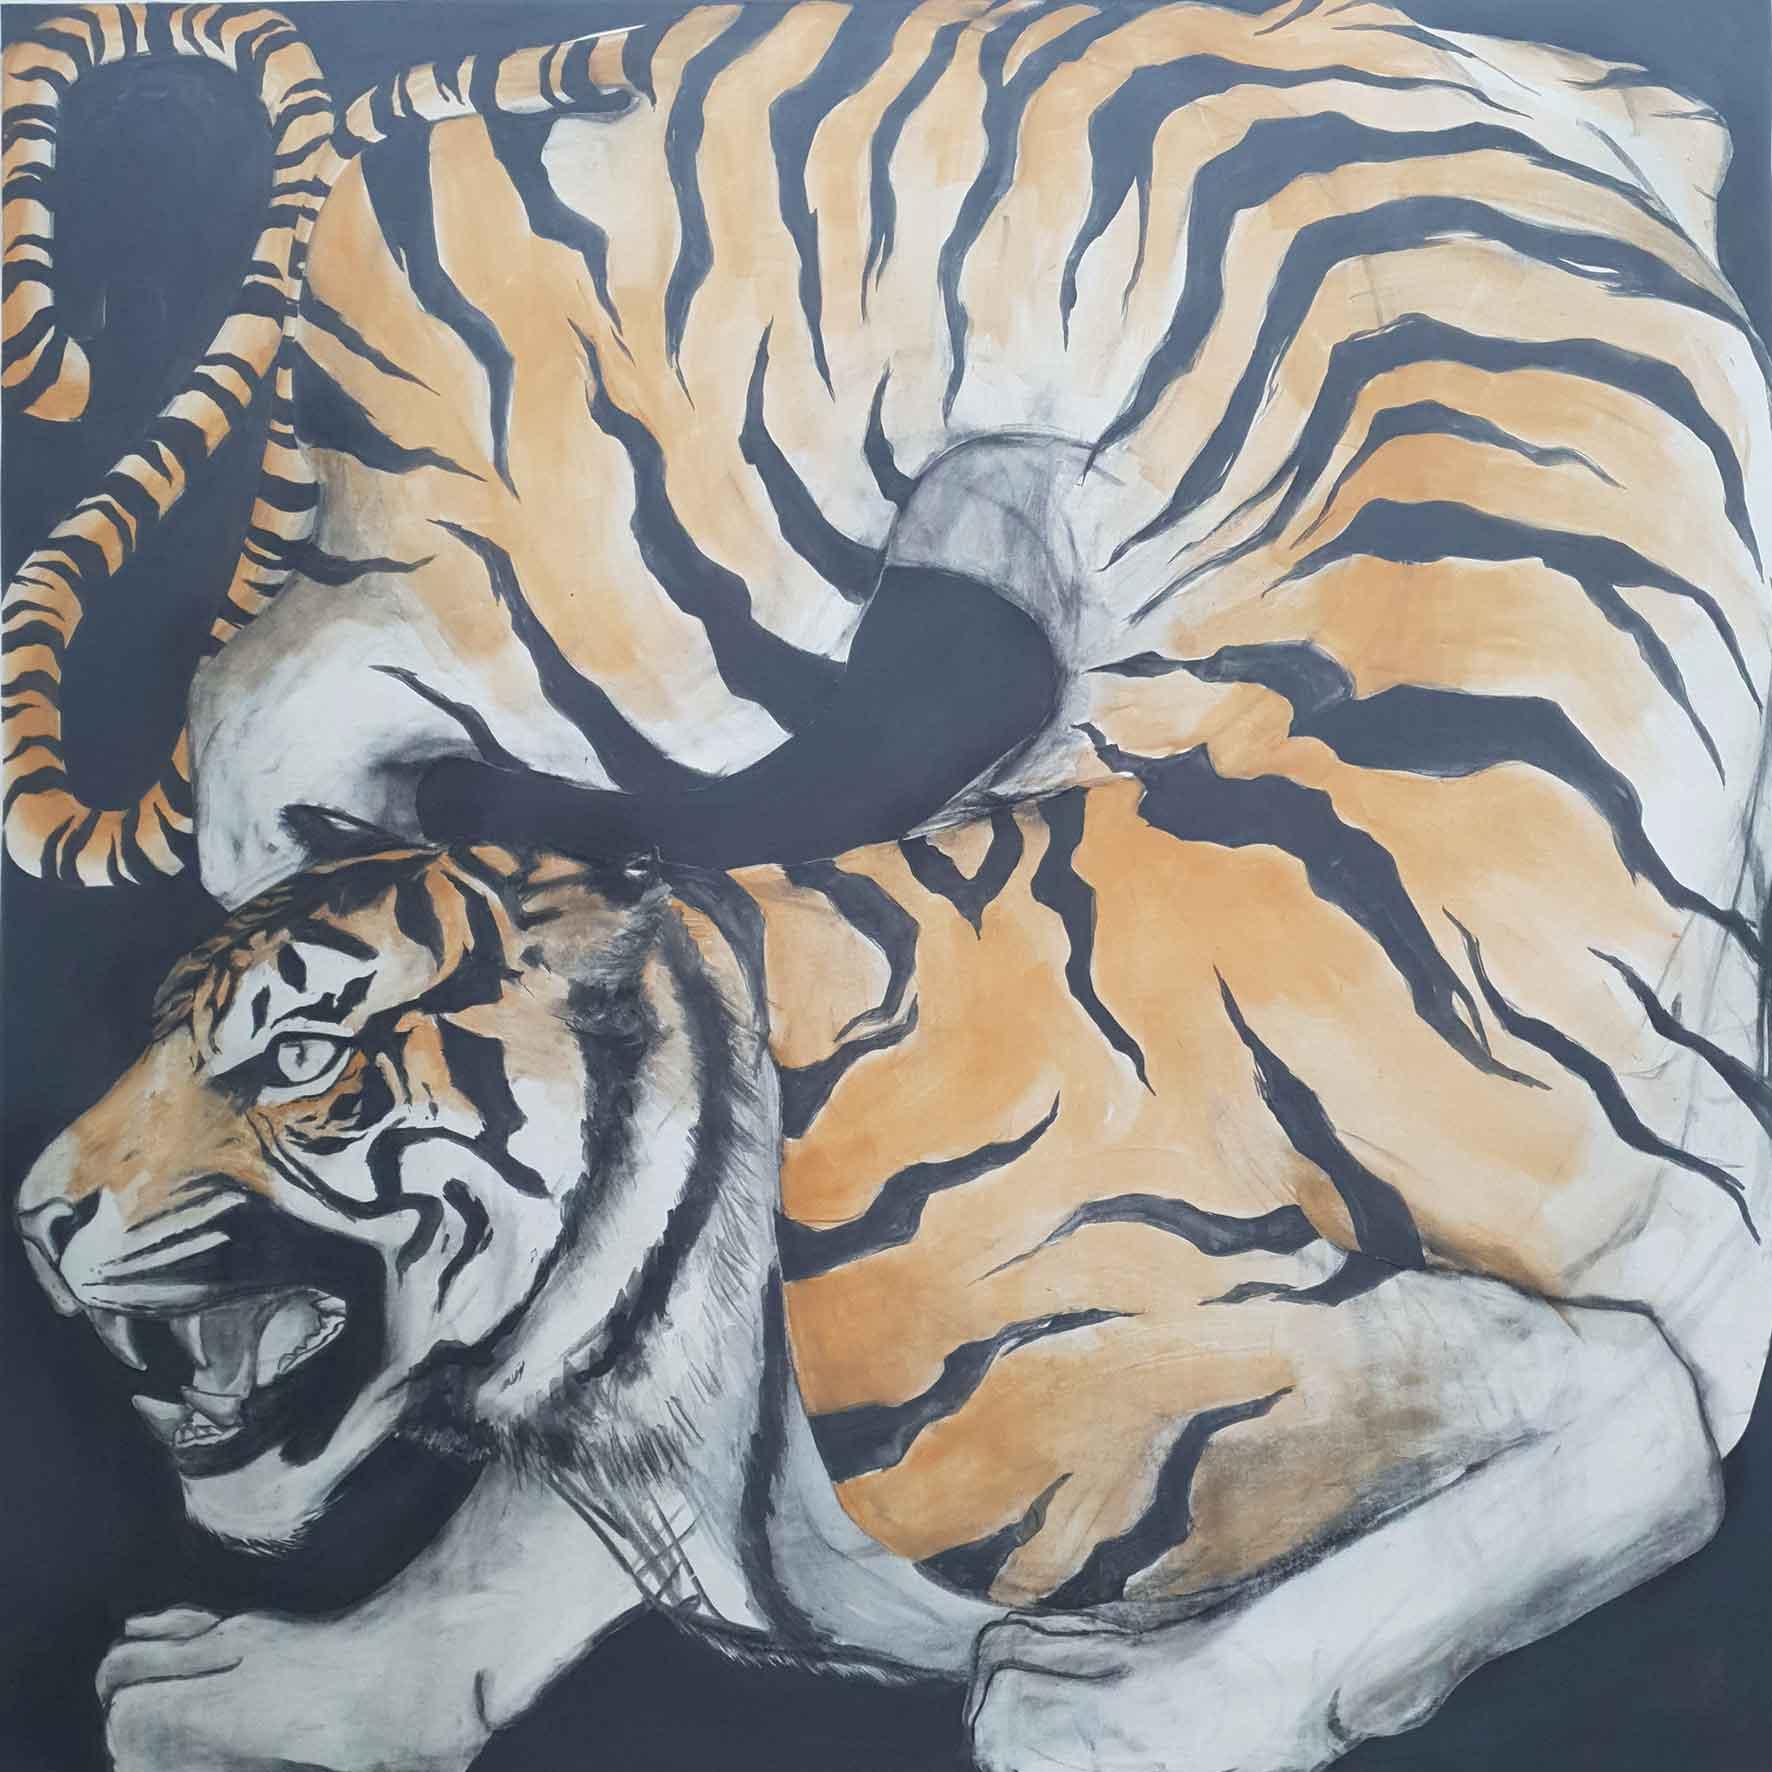 Zimbiri-tiger-Grosvenor-Gallery-ST-JAMES